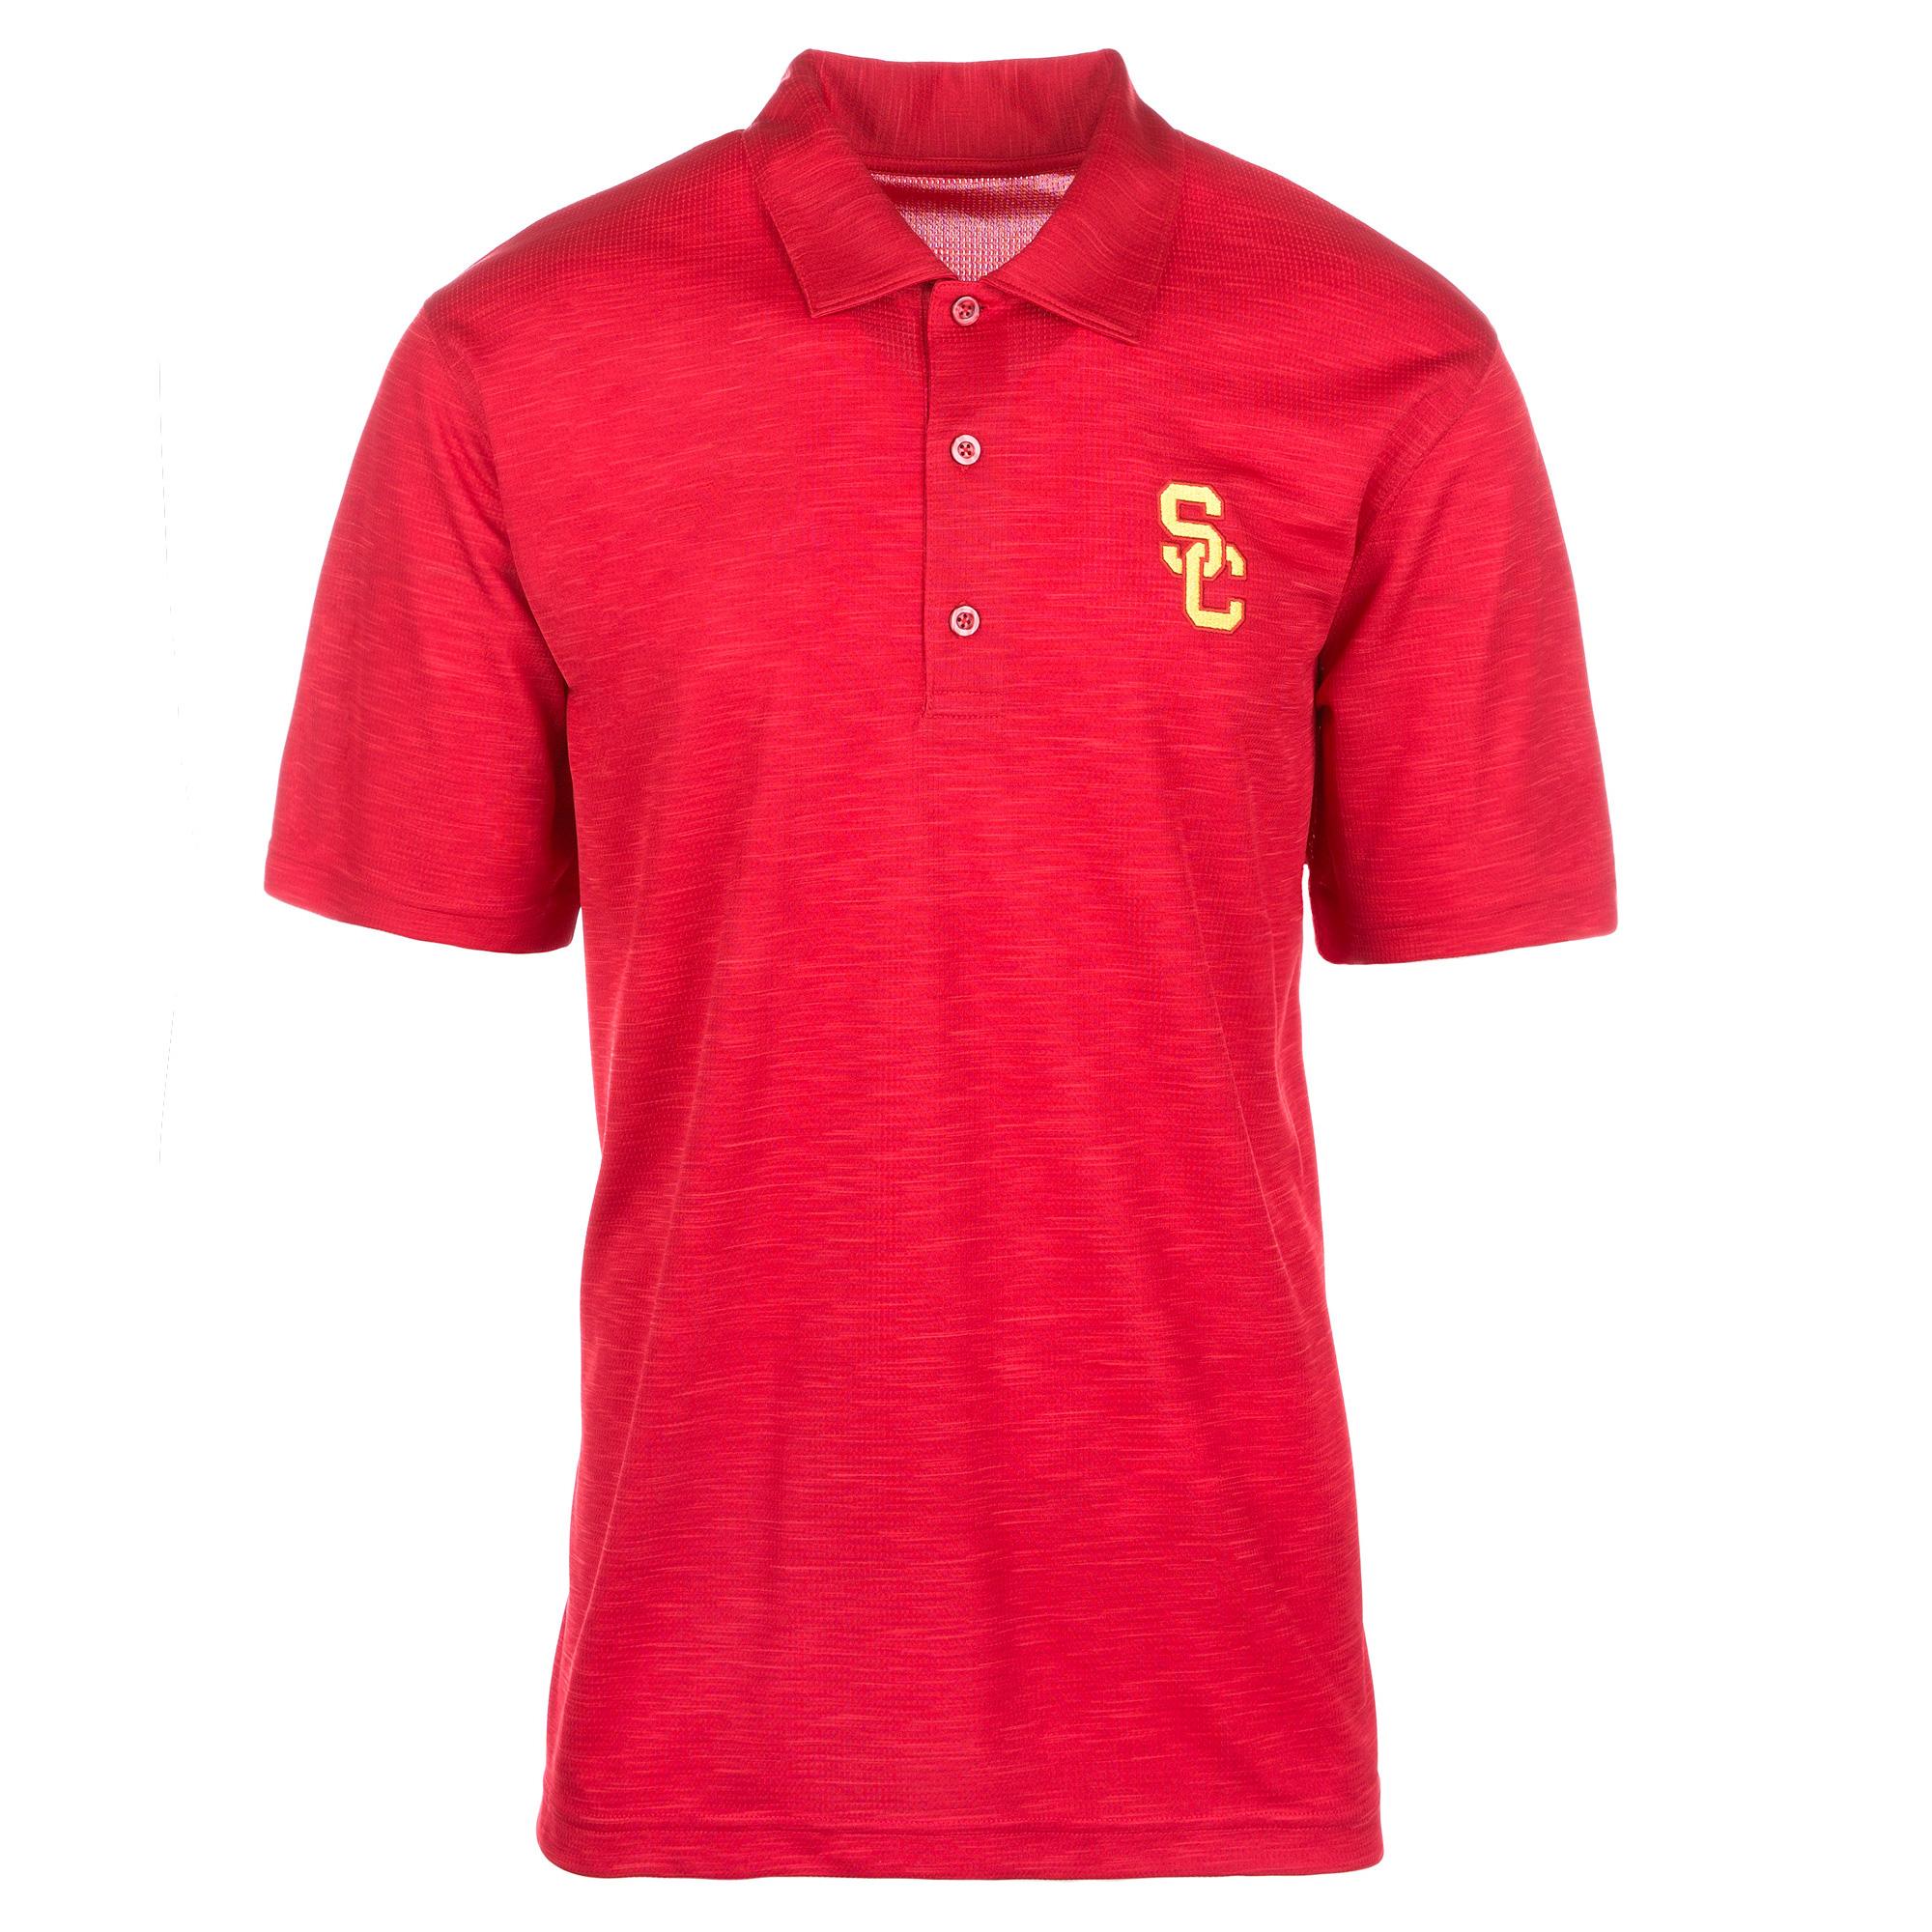 Men's Cardinal USC Trojans Drakar Basic Polo